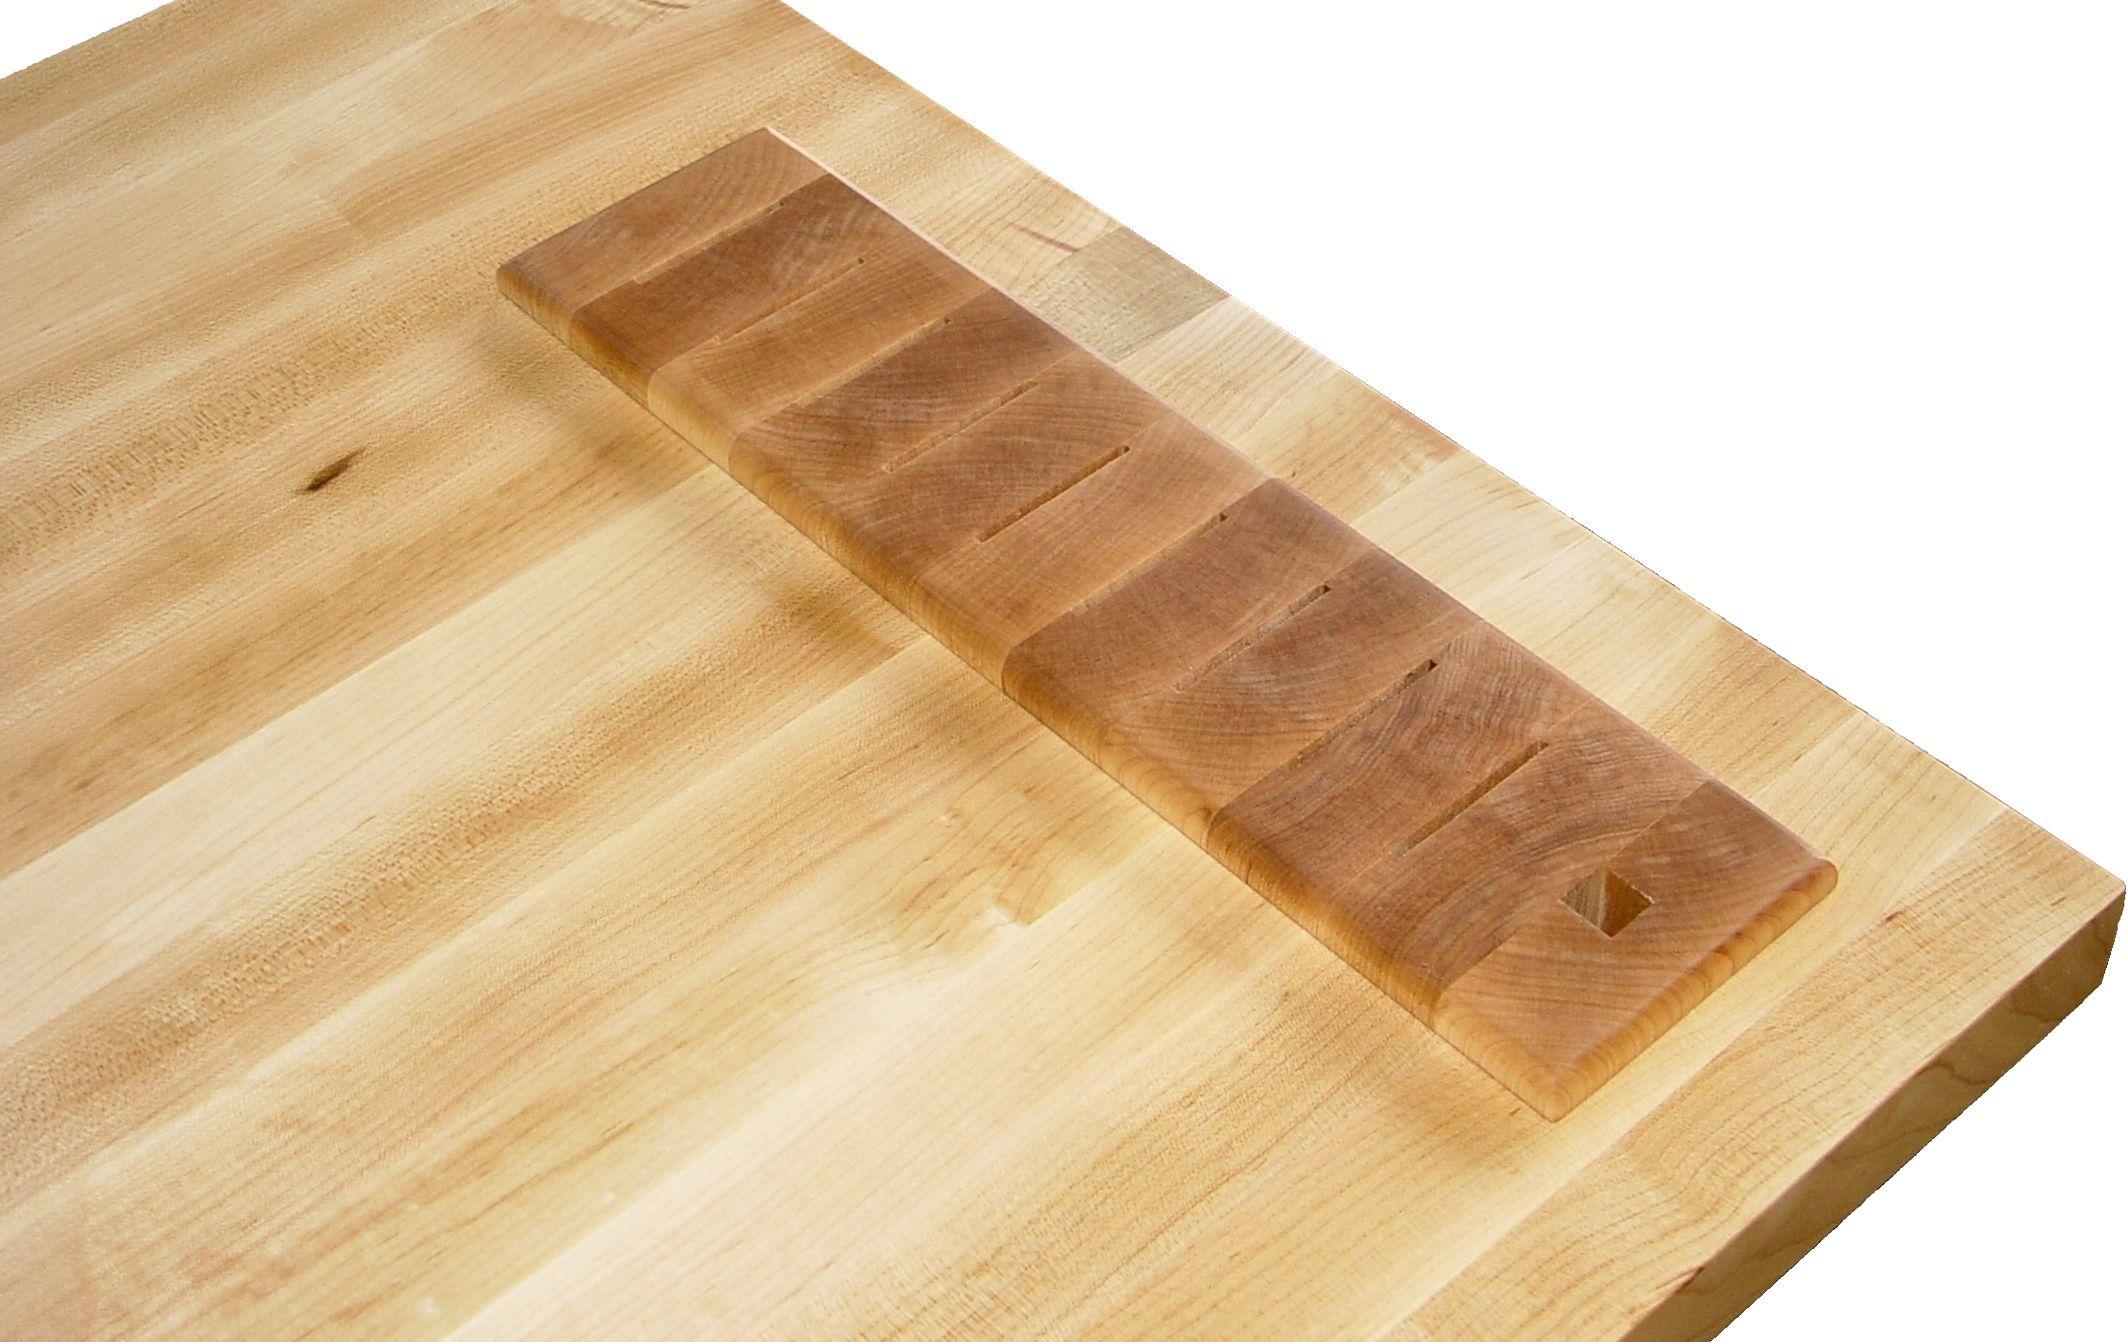 Removable Knife Blocks